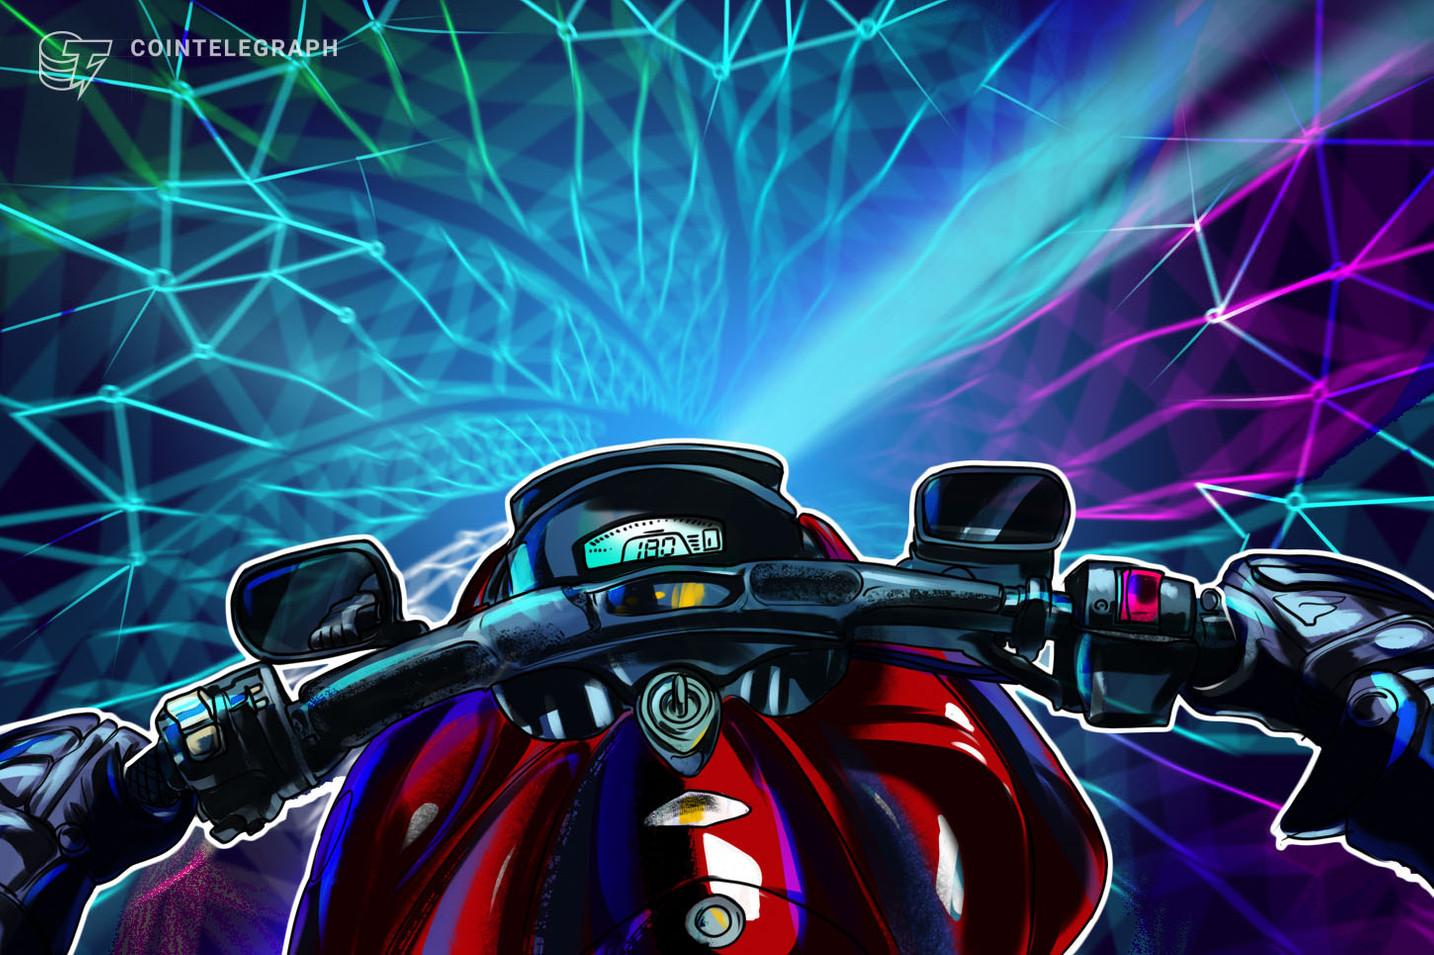 Gigante chino de Internet Tencent lanza acelerador blockchain